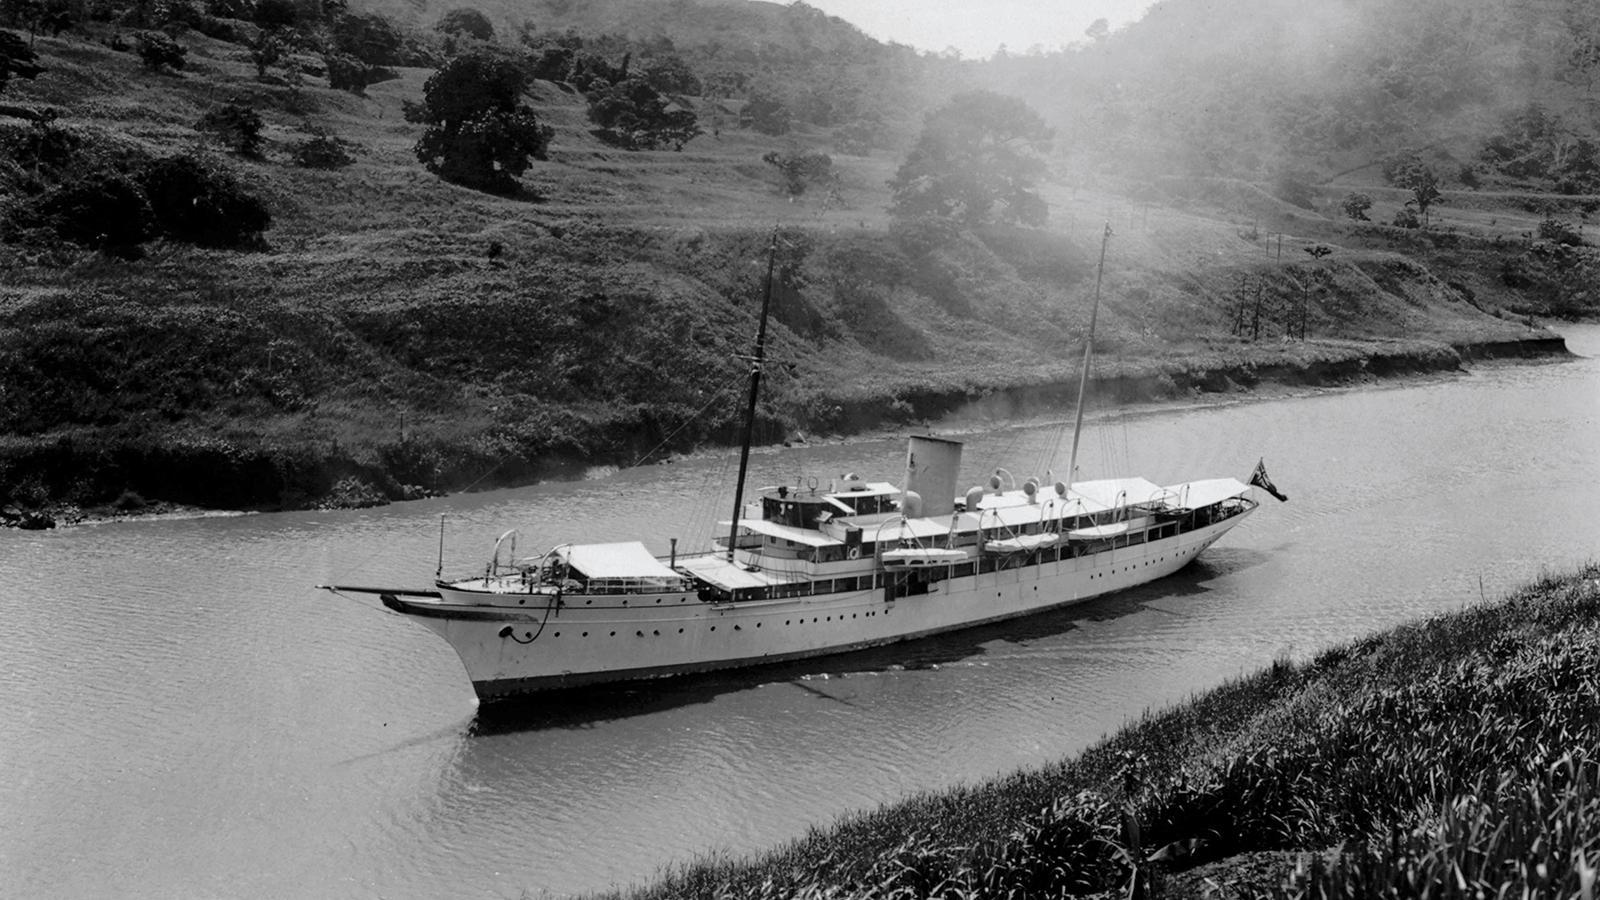 nahlin-classic-motor-yacht-brown-j-1930-91m-canal